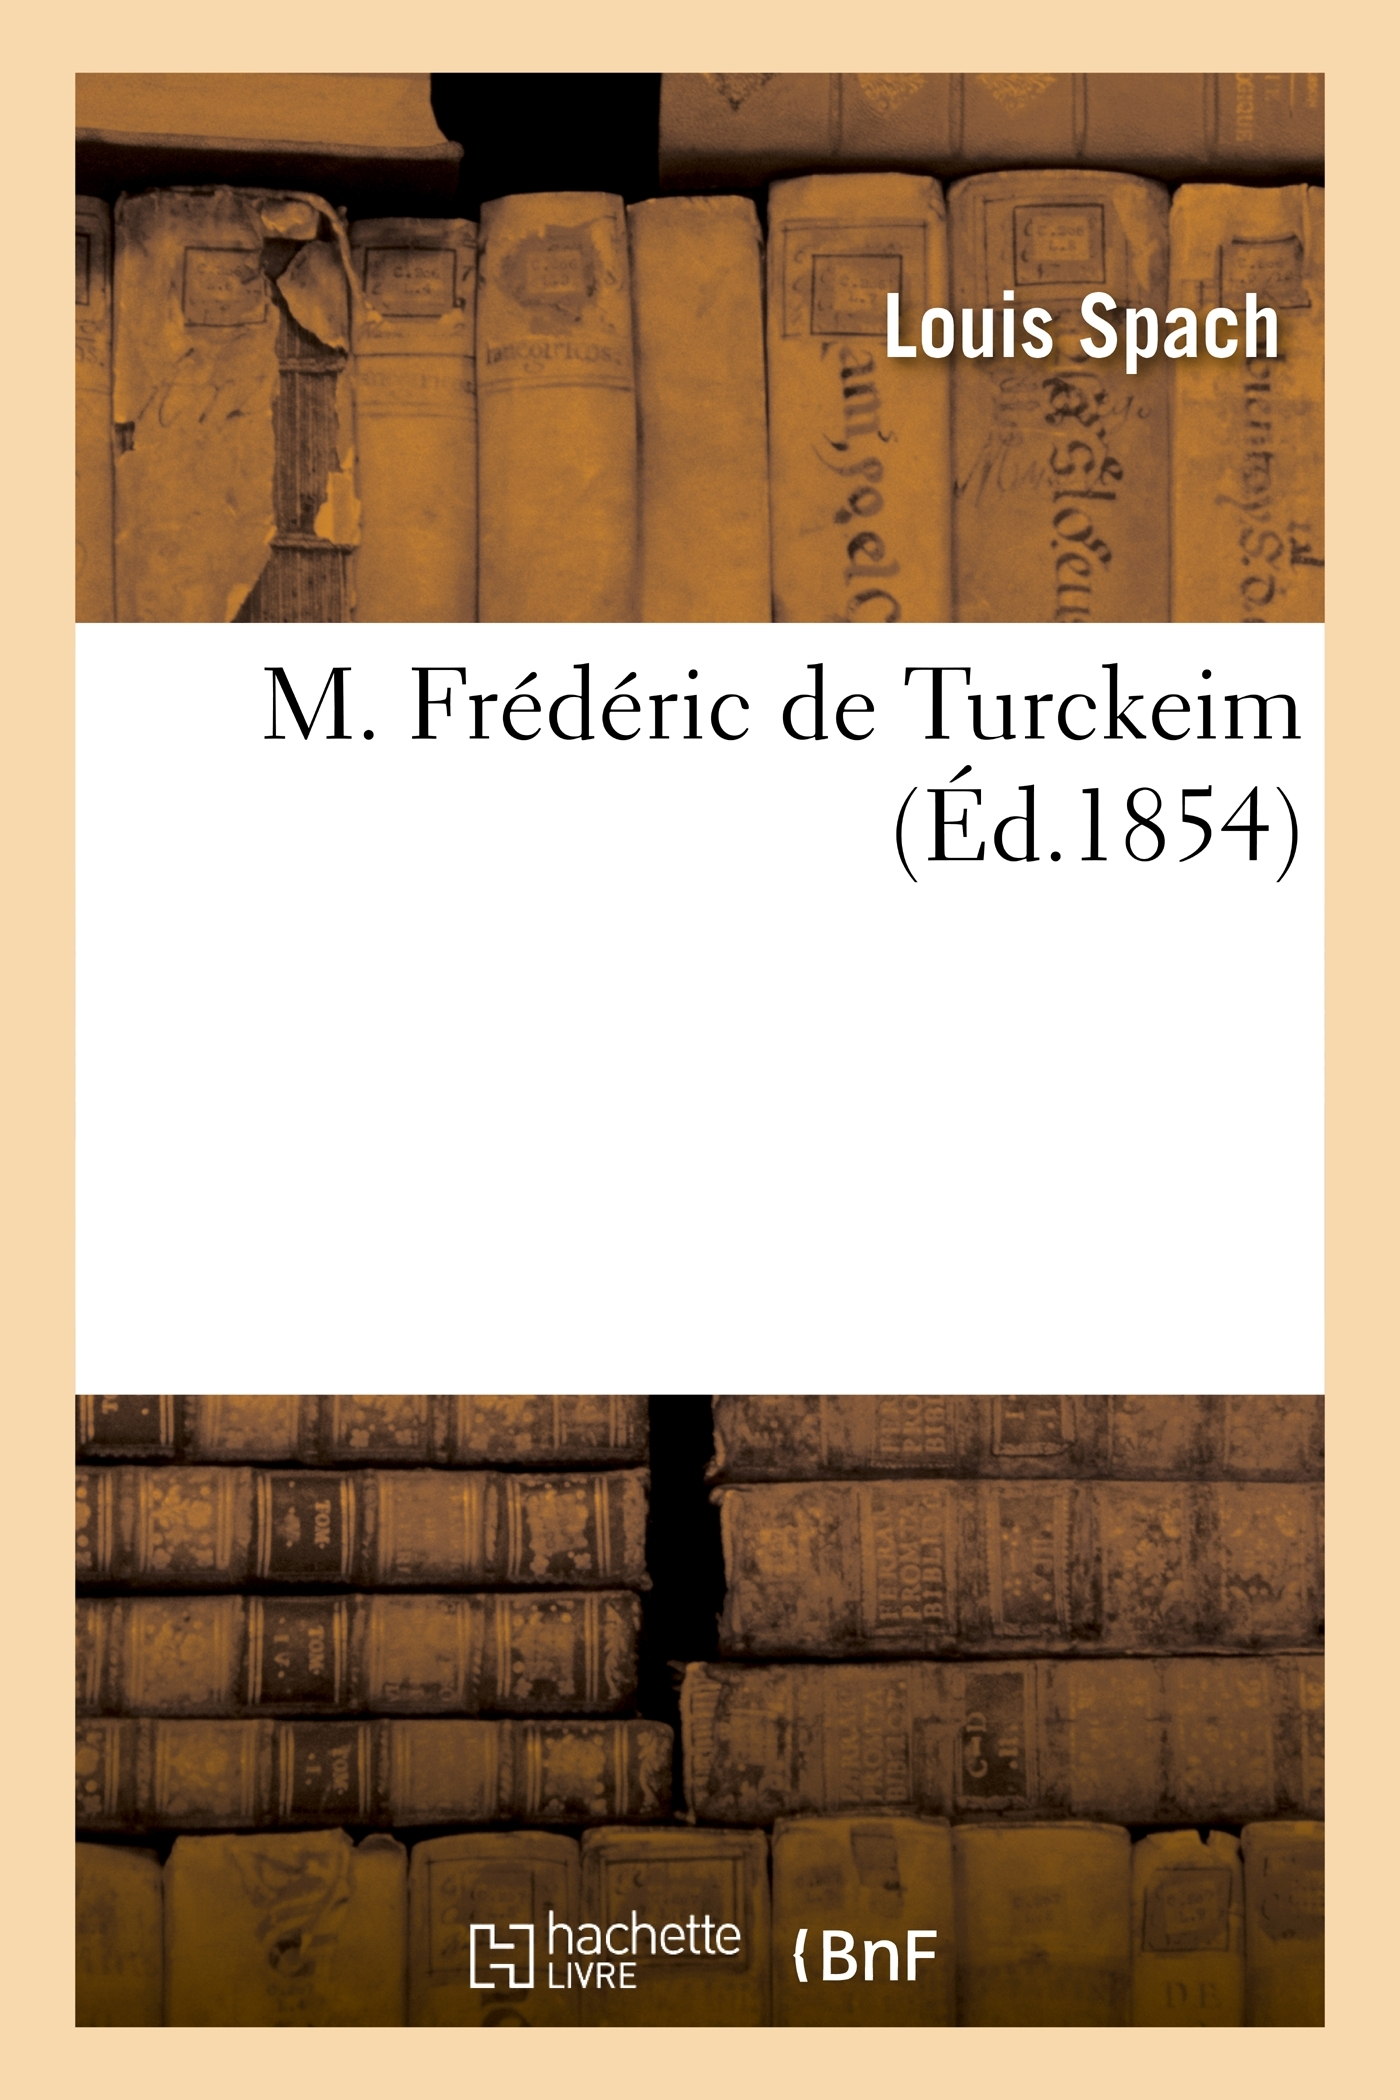 M. FREDERIC DE TURCKEIM